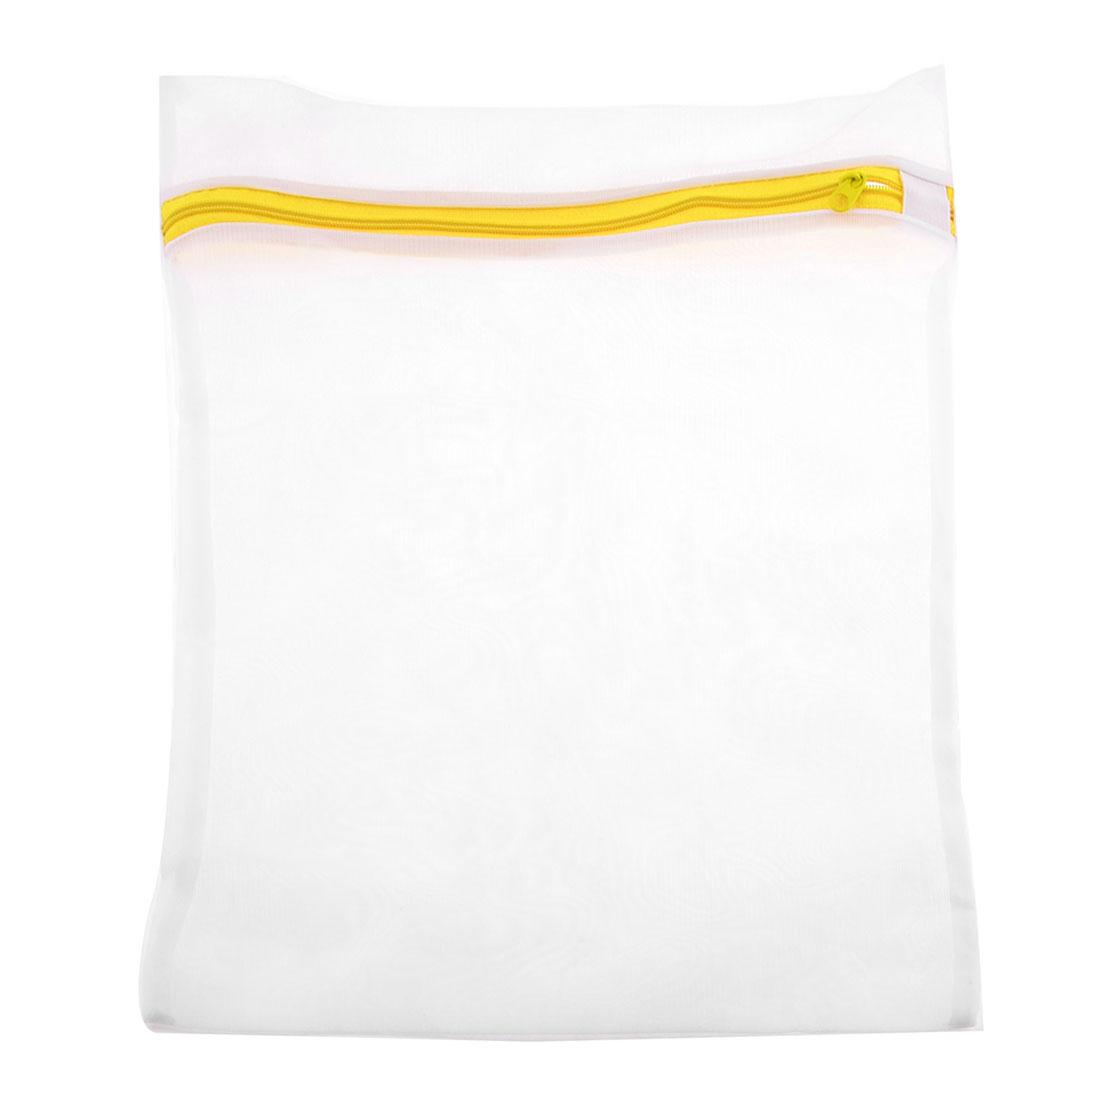 Portable White Yellow Nylon Underwear Lingerie Clothes Washing Bag 39cm x 28cm